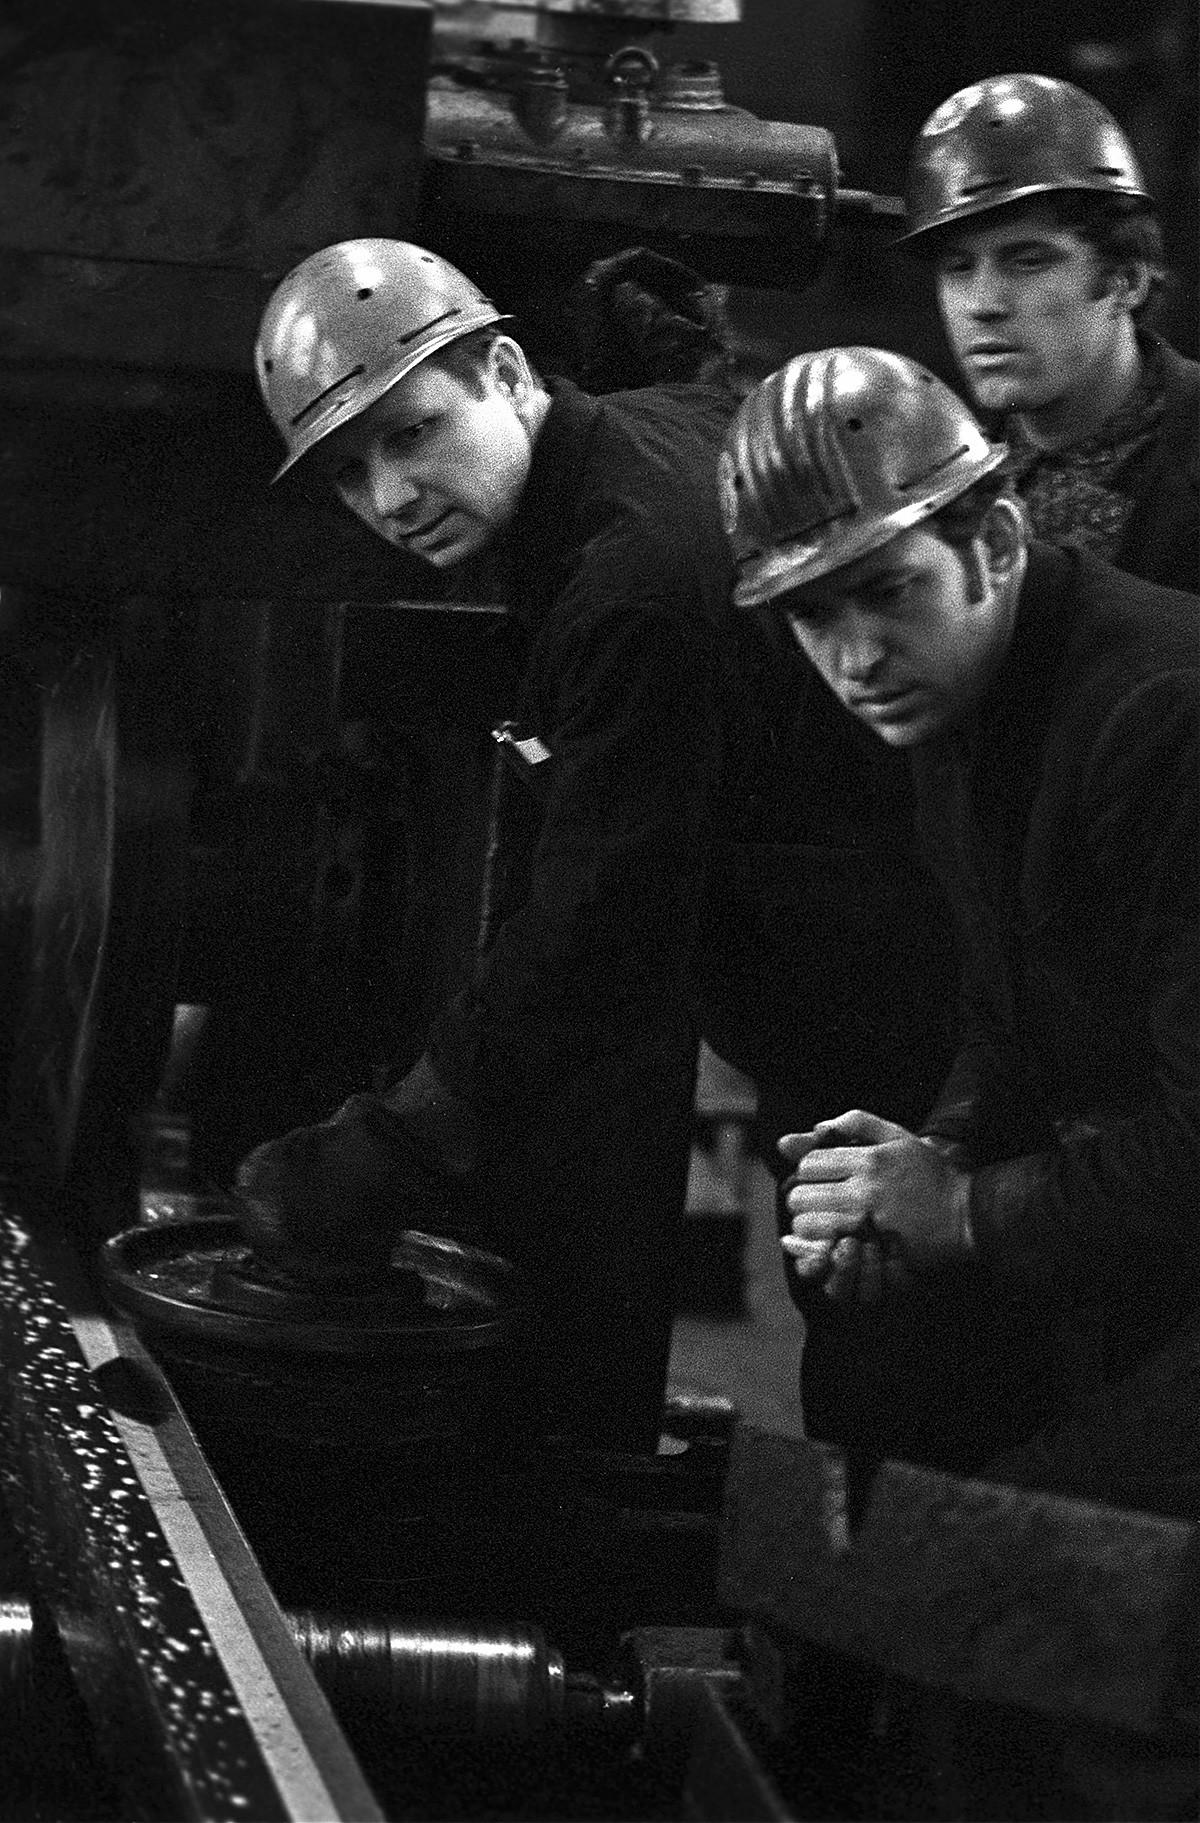 Usine métallurgique Zaporojstal, 1974